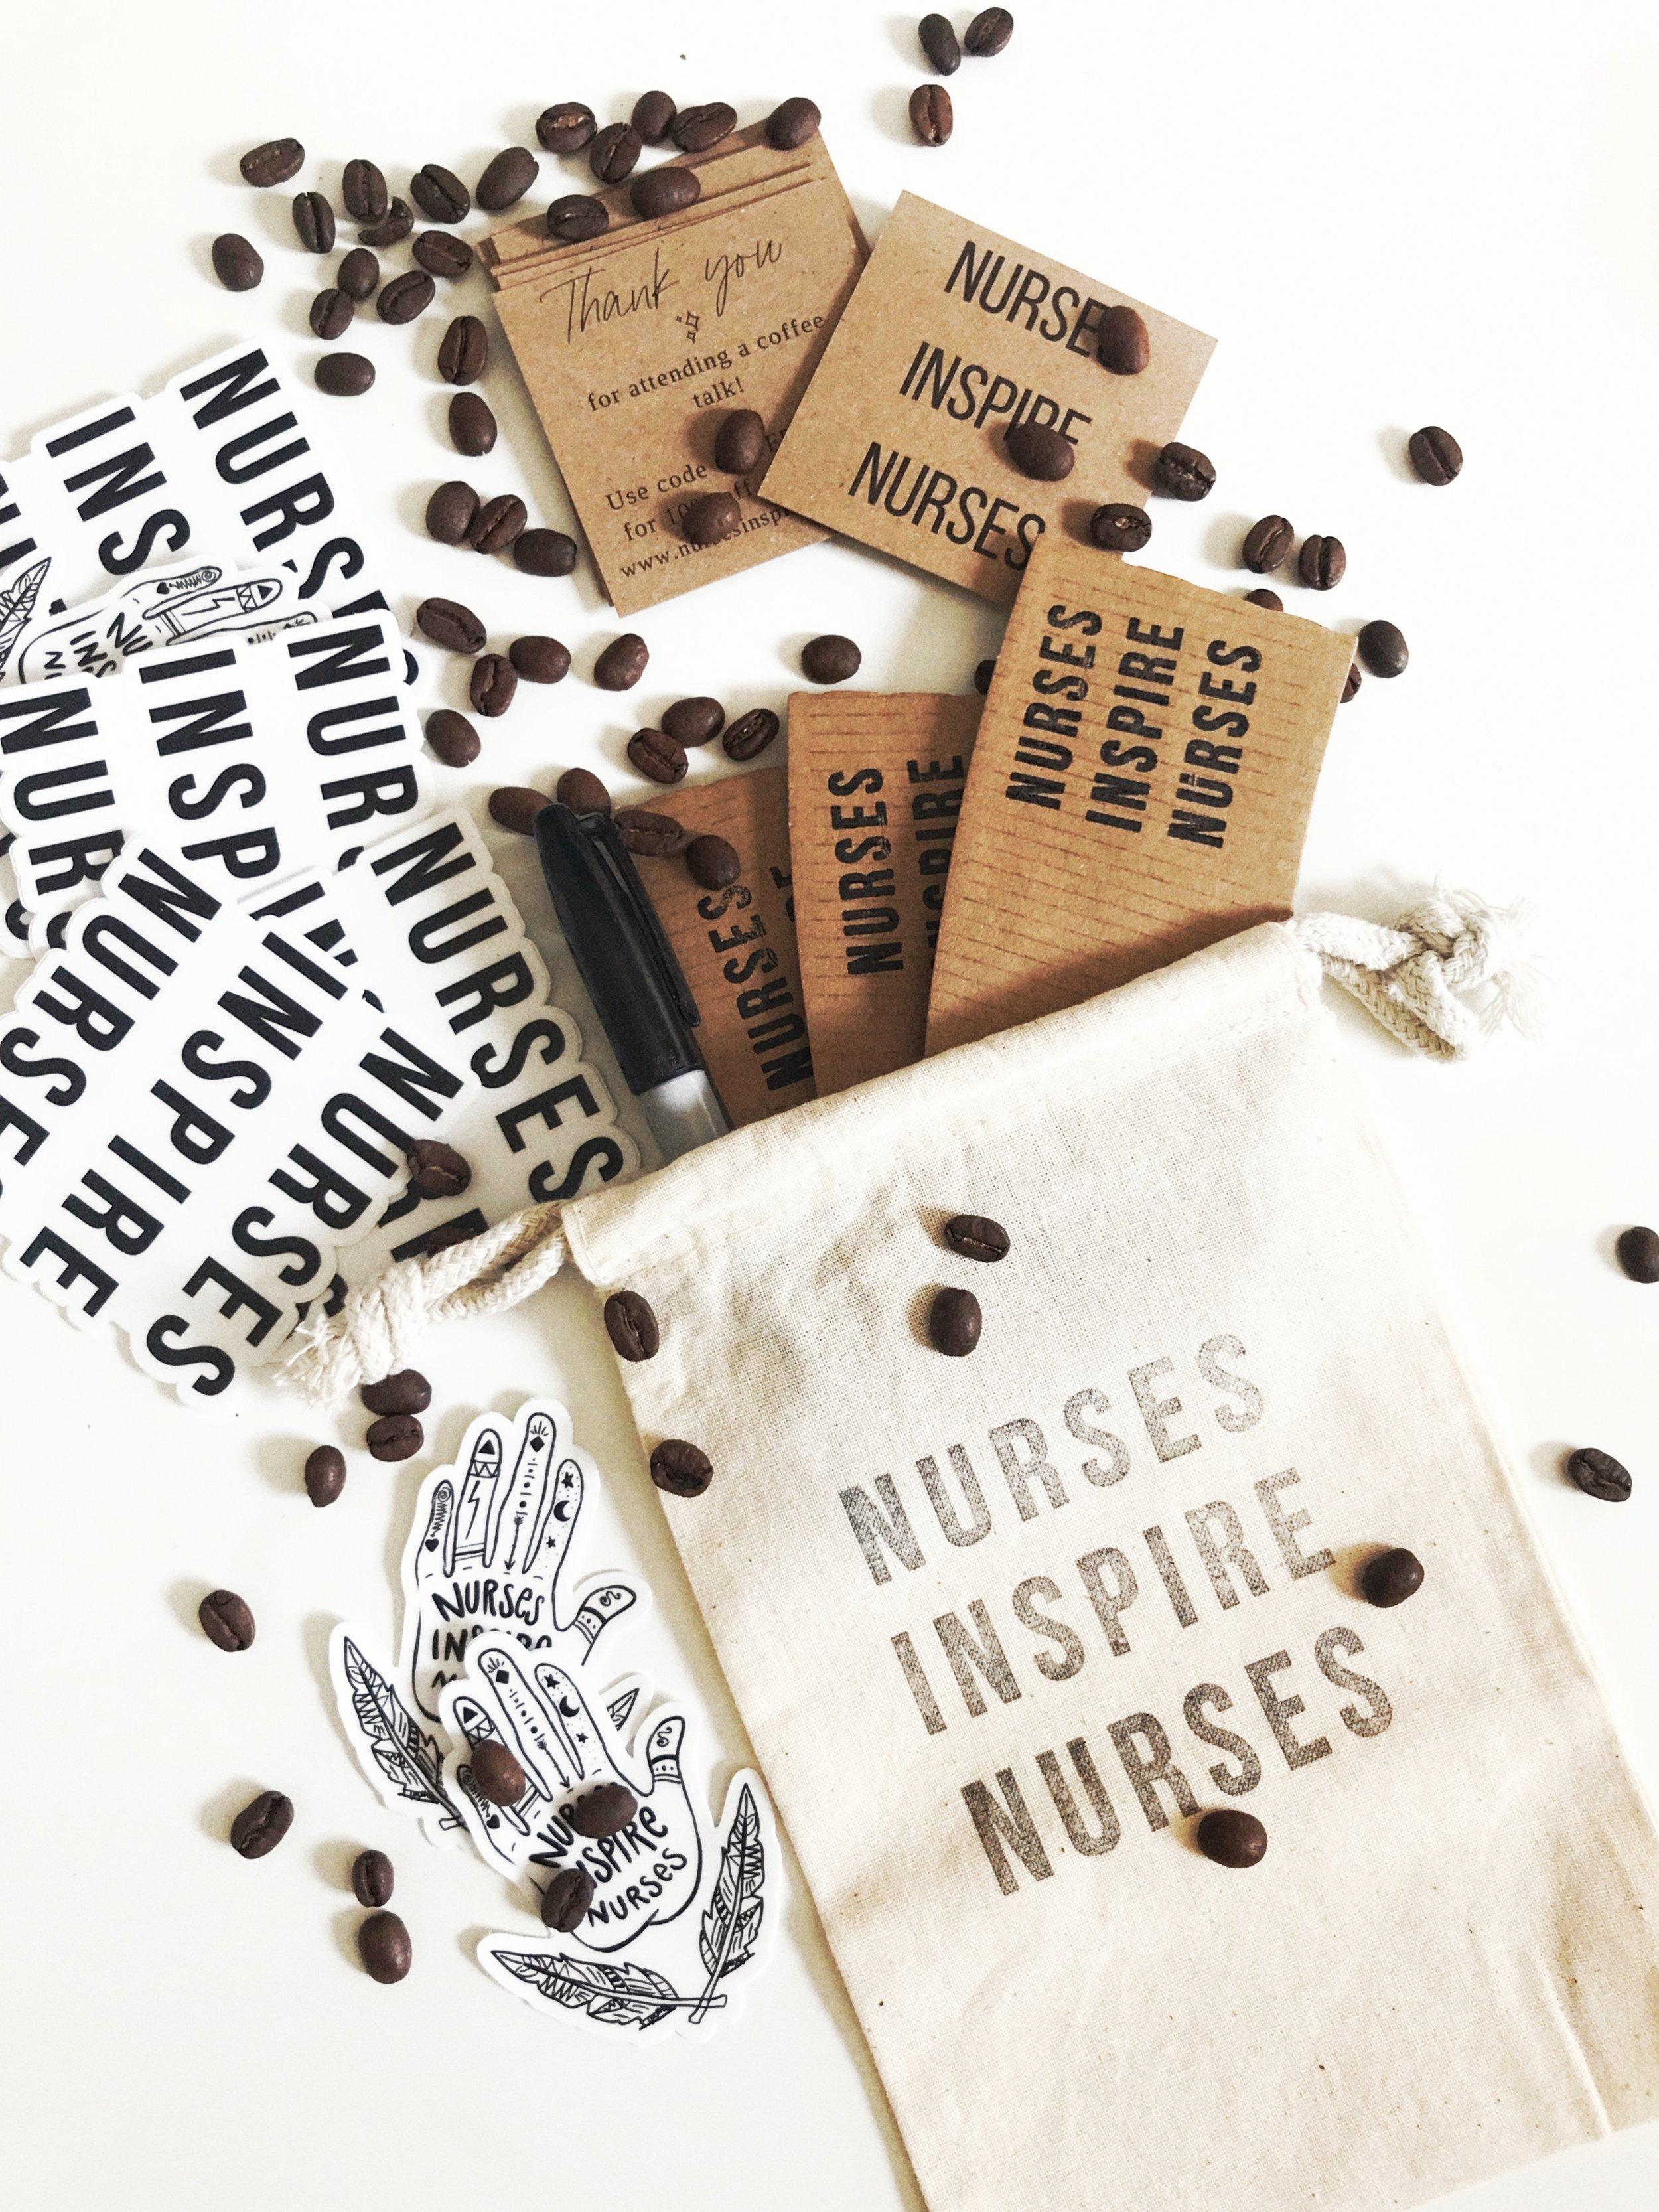 nurses inspire nurses candles, nurses inspire nurses tumblers, healing hands coffee, coffee mugs, leap land live method